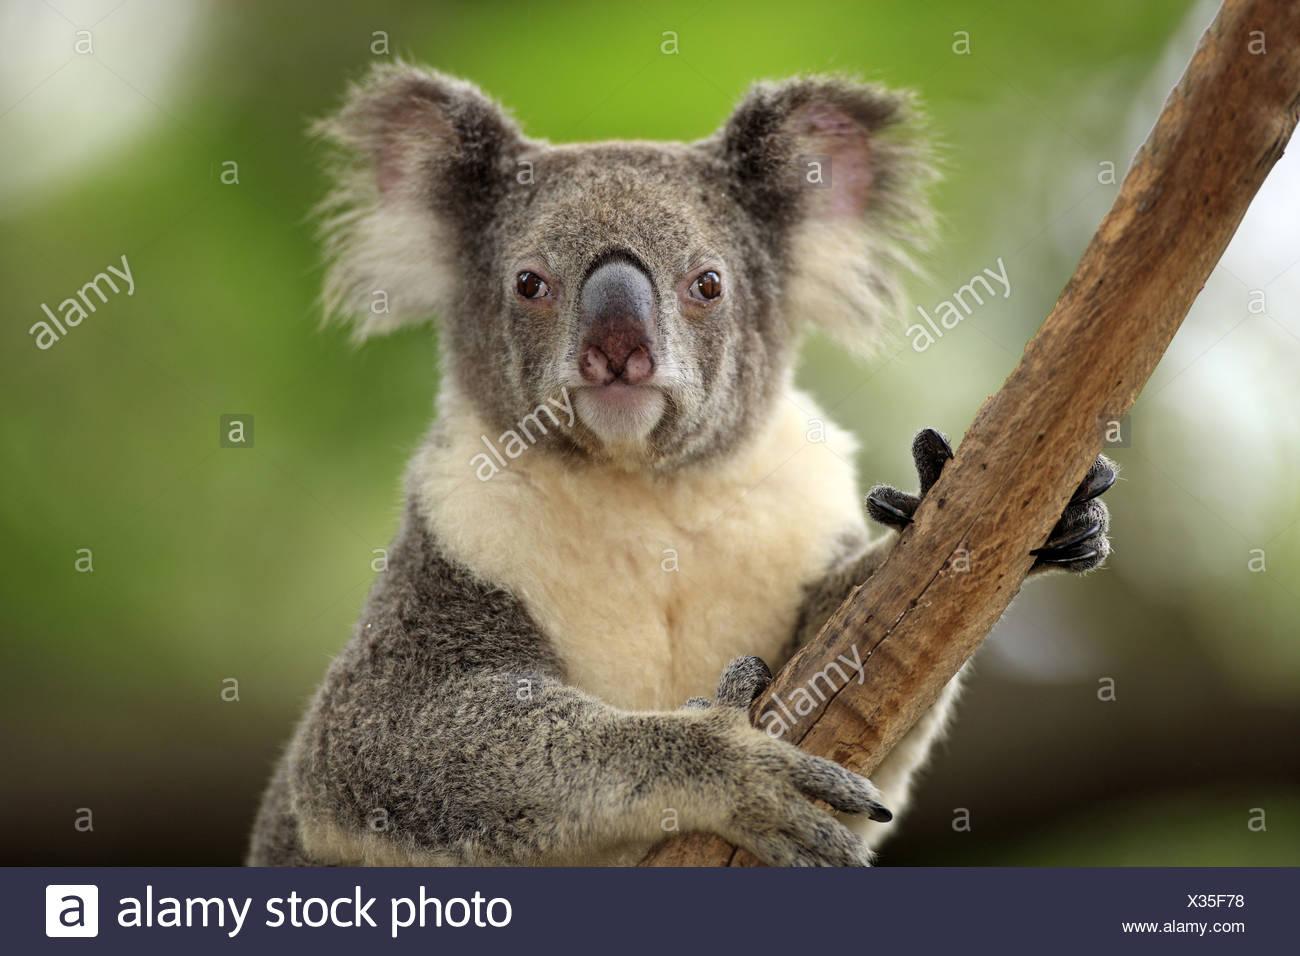 auf Baum - on tree Portrait - close up koala koalas